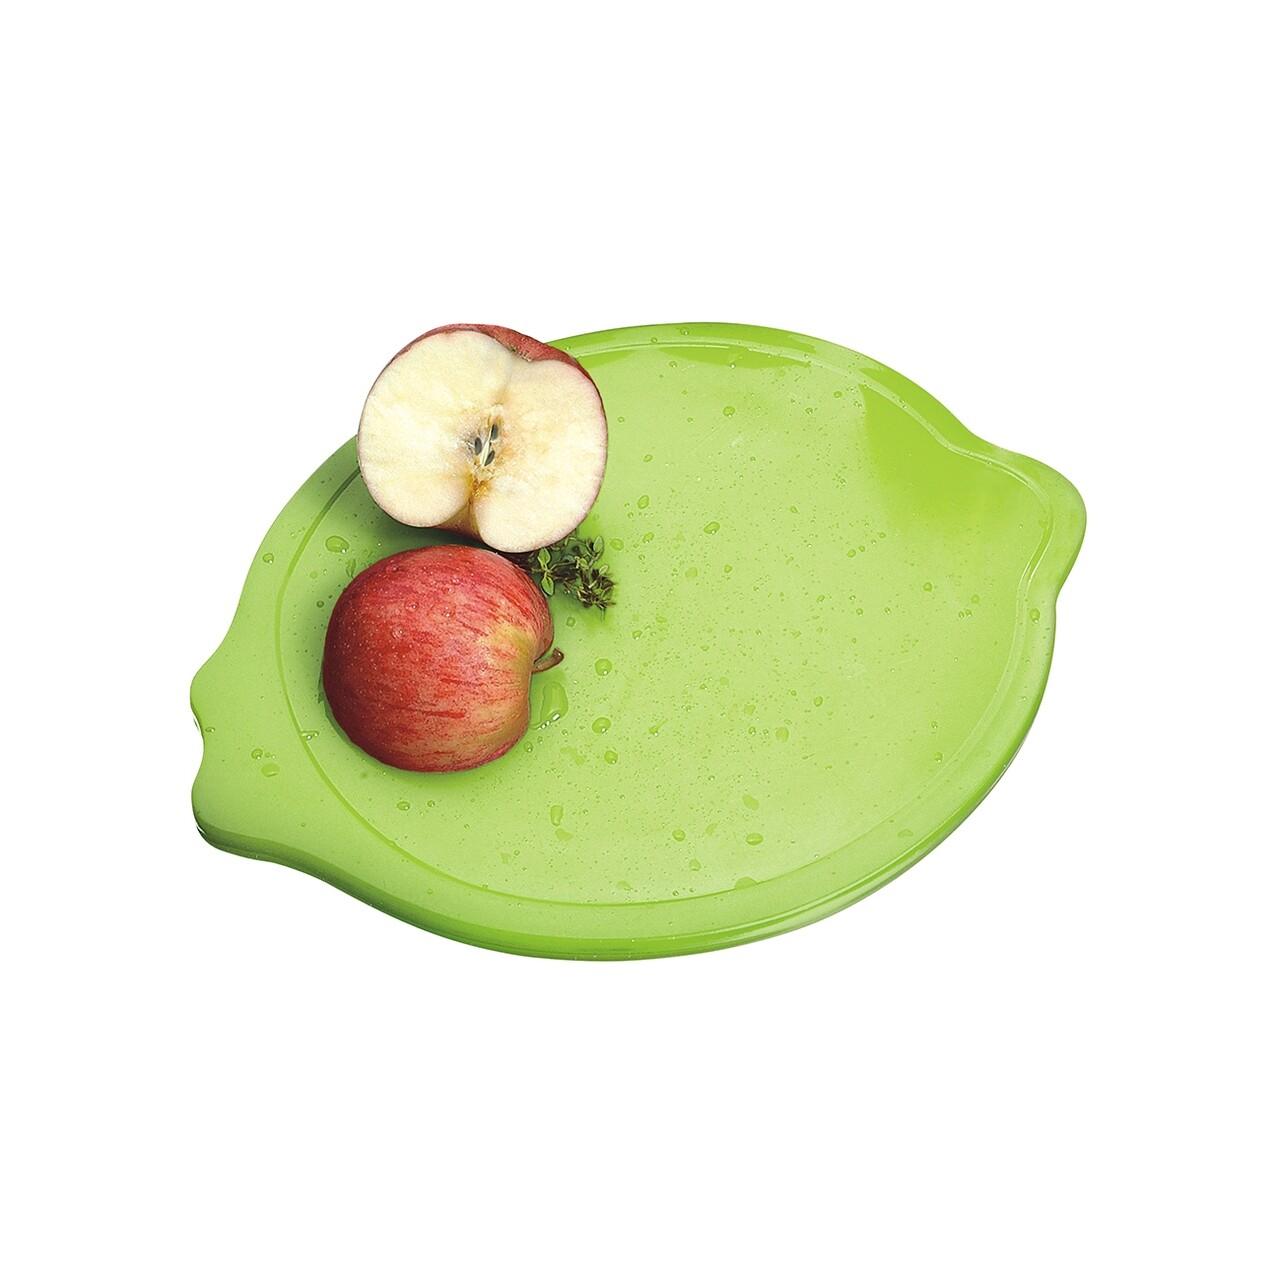 Tocator in forma de lamaie, Casar, 0.8 x 21.7 x 28.5 cm, plastic, verde